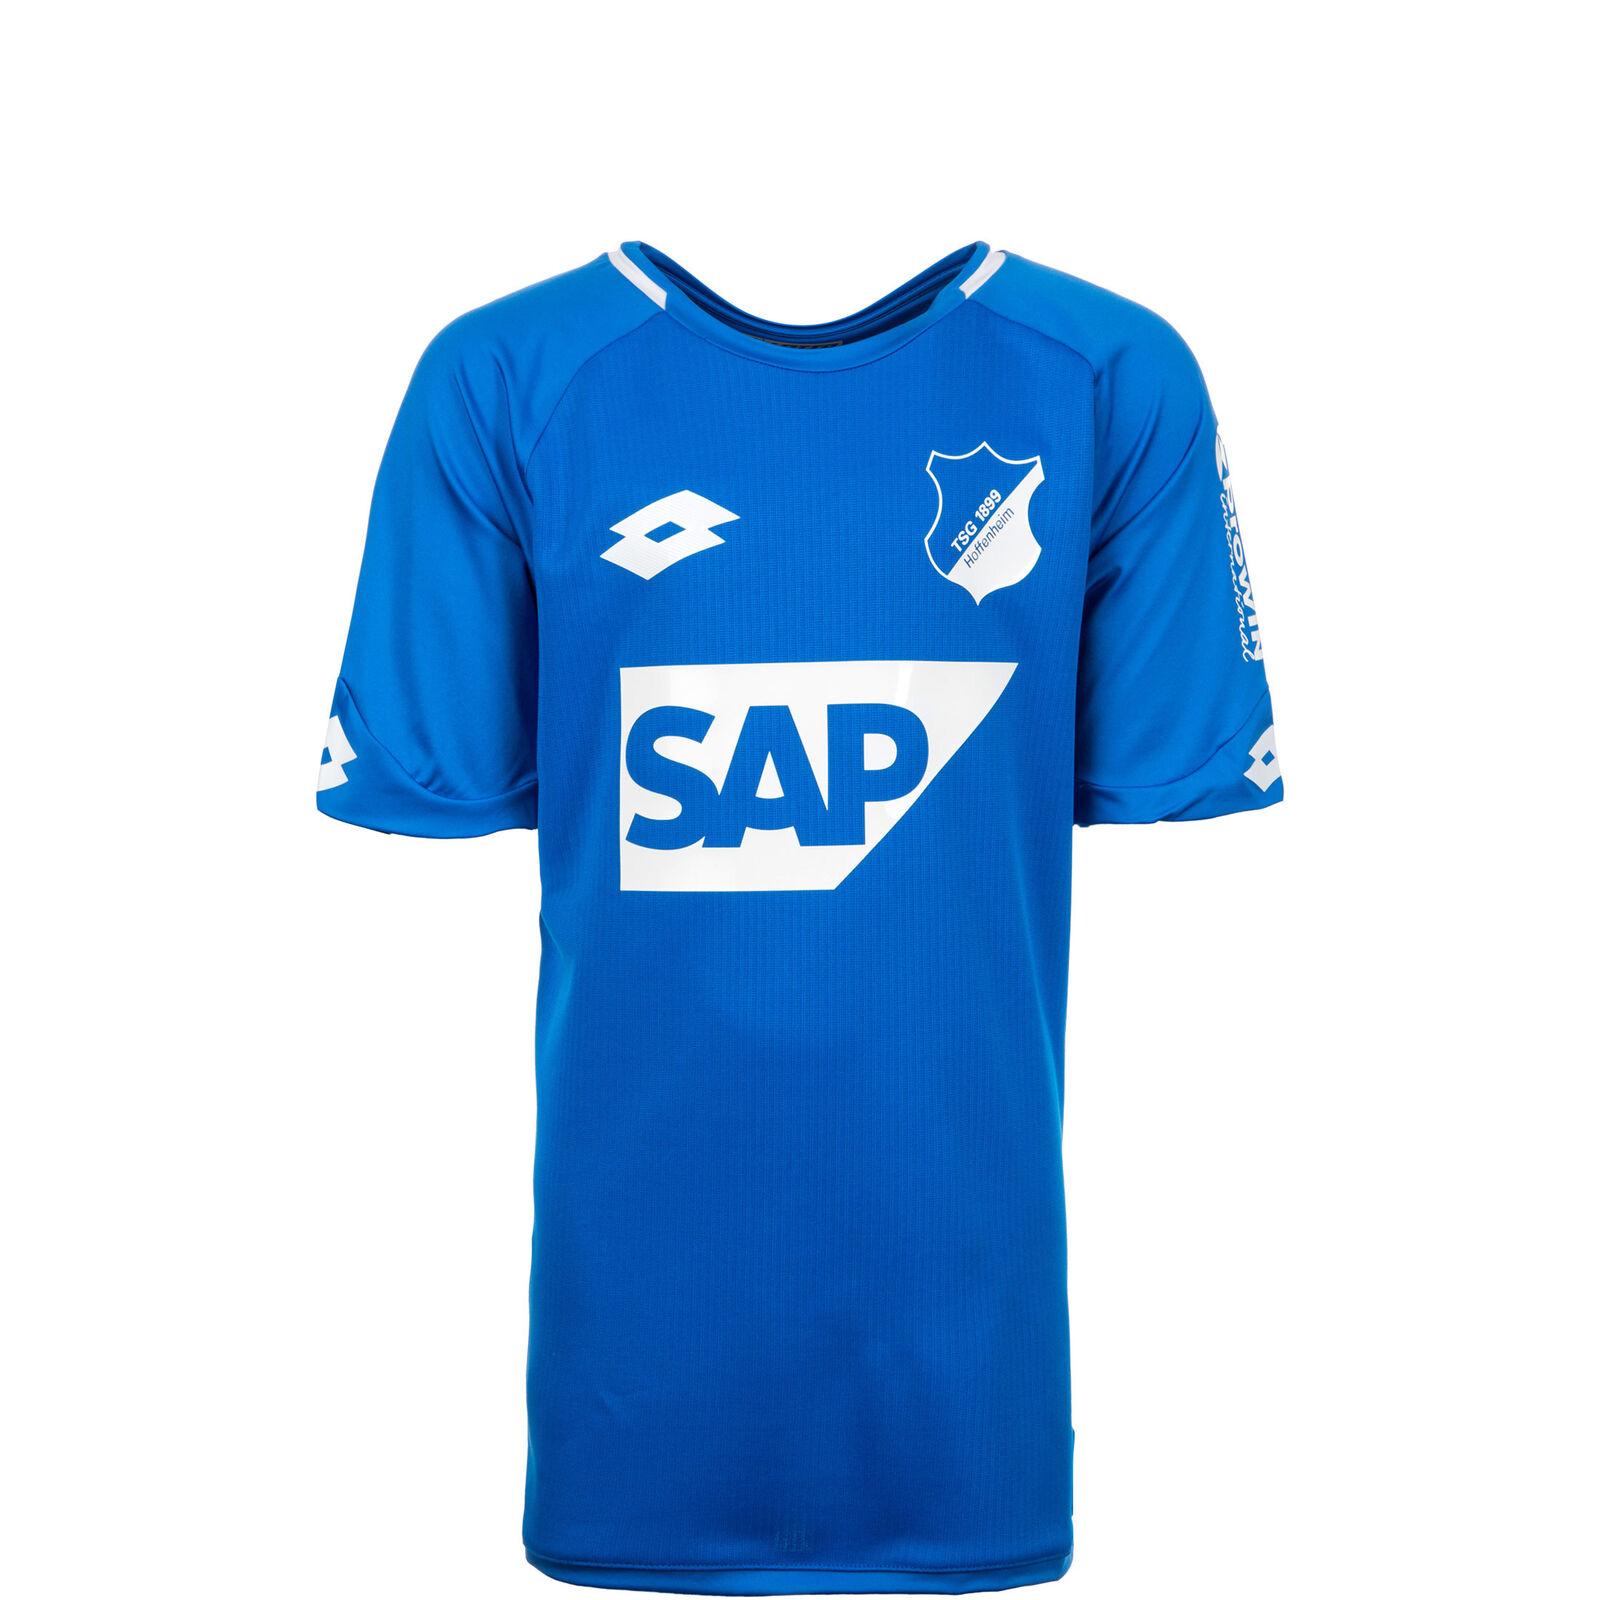 Lotto 1899 Hoffenheim Trikot Home 2018/2019 Kinder Blau NEU